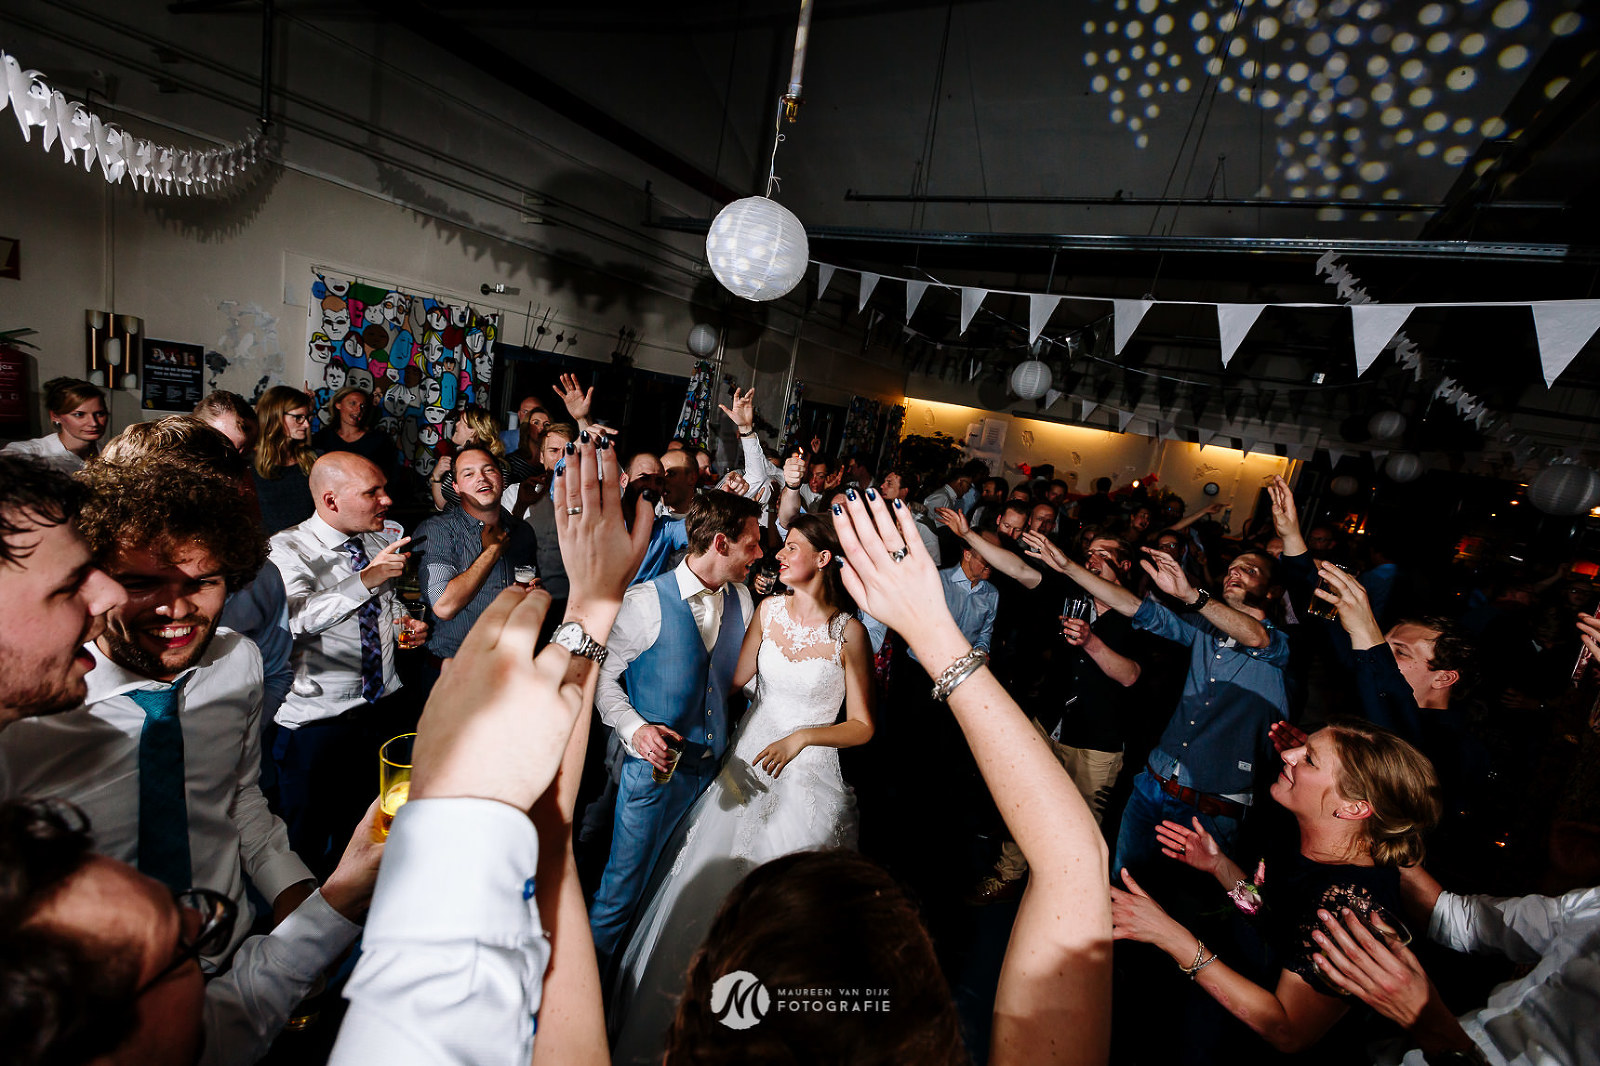 Huwelijksfeest, Stadslab Indië Almelo, Bruidsfotograaf Twente